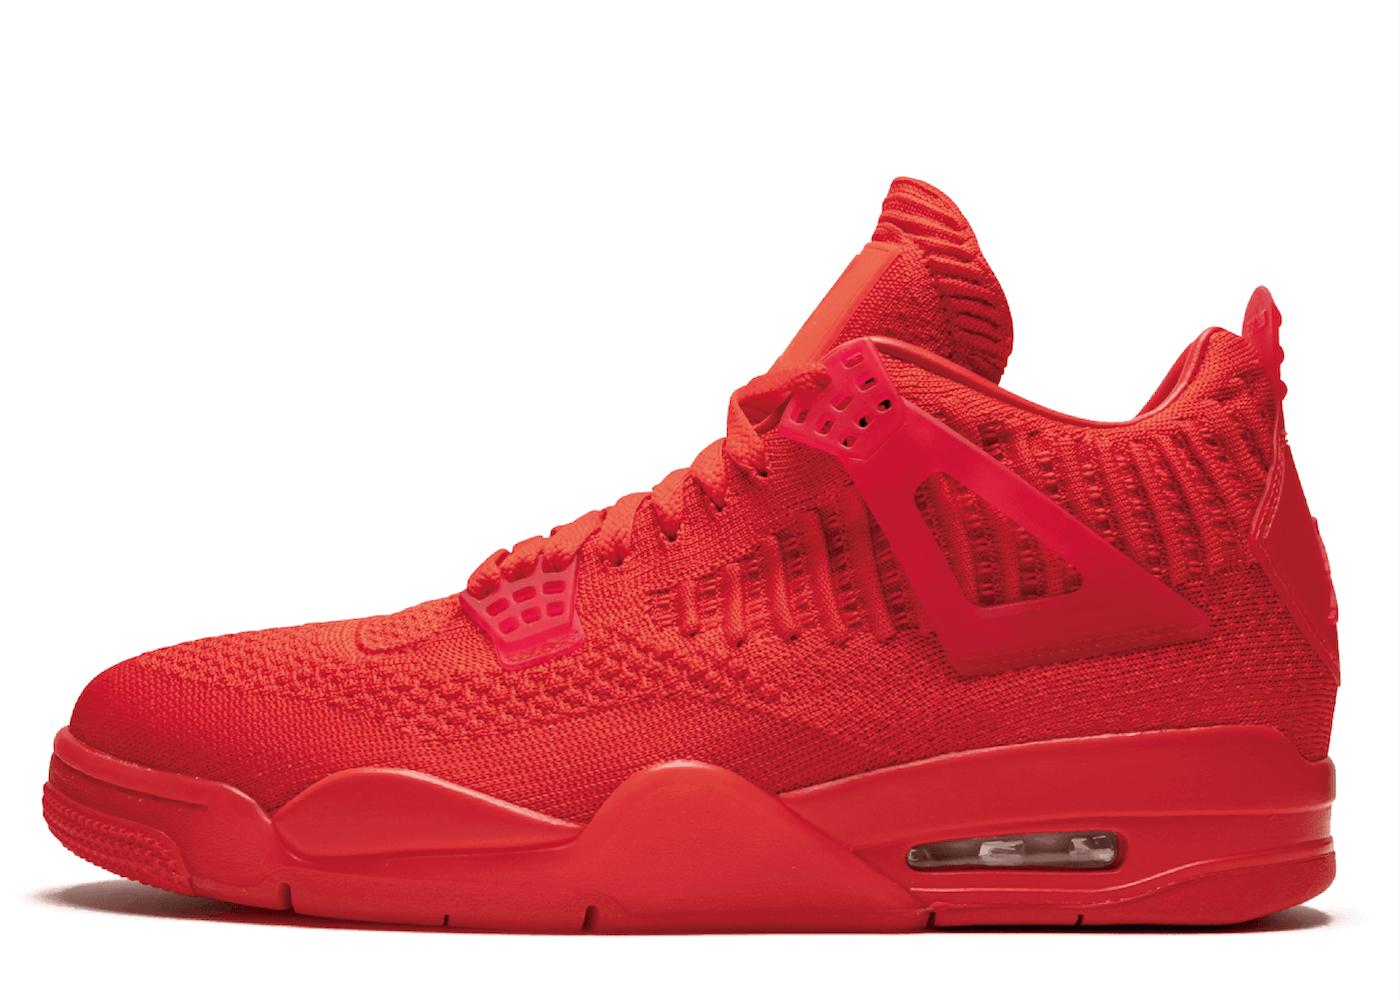 Nike Air Jordan 4 Retro Flyknit Redの写真